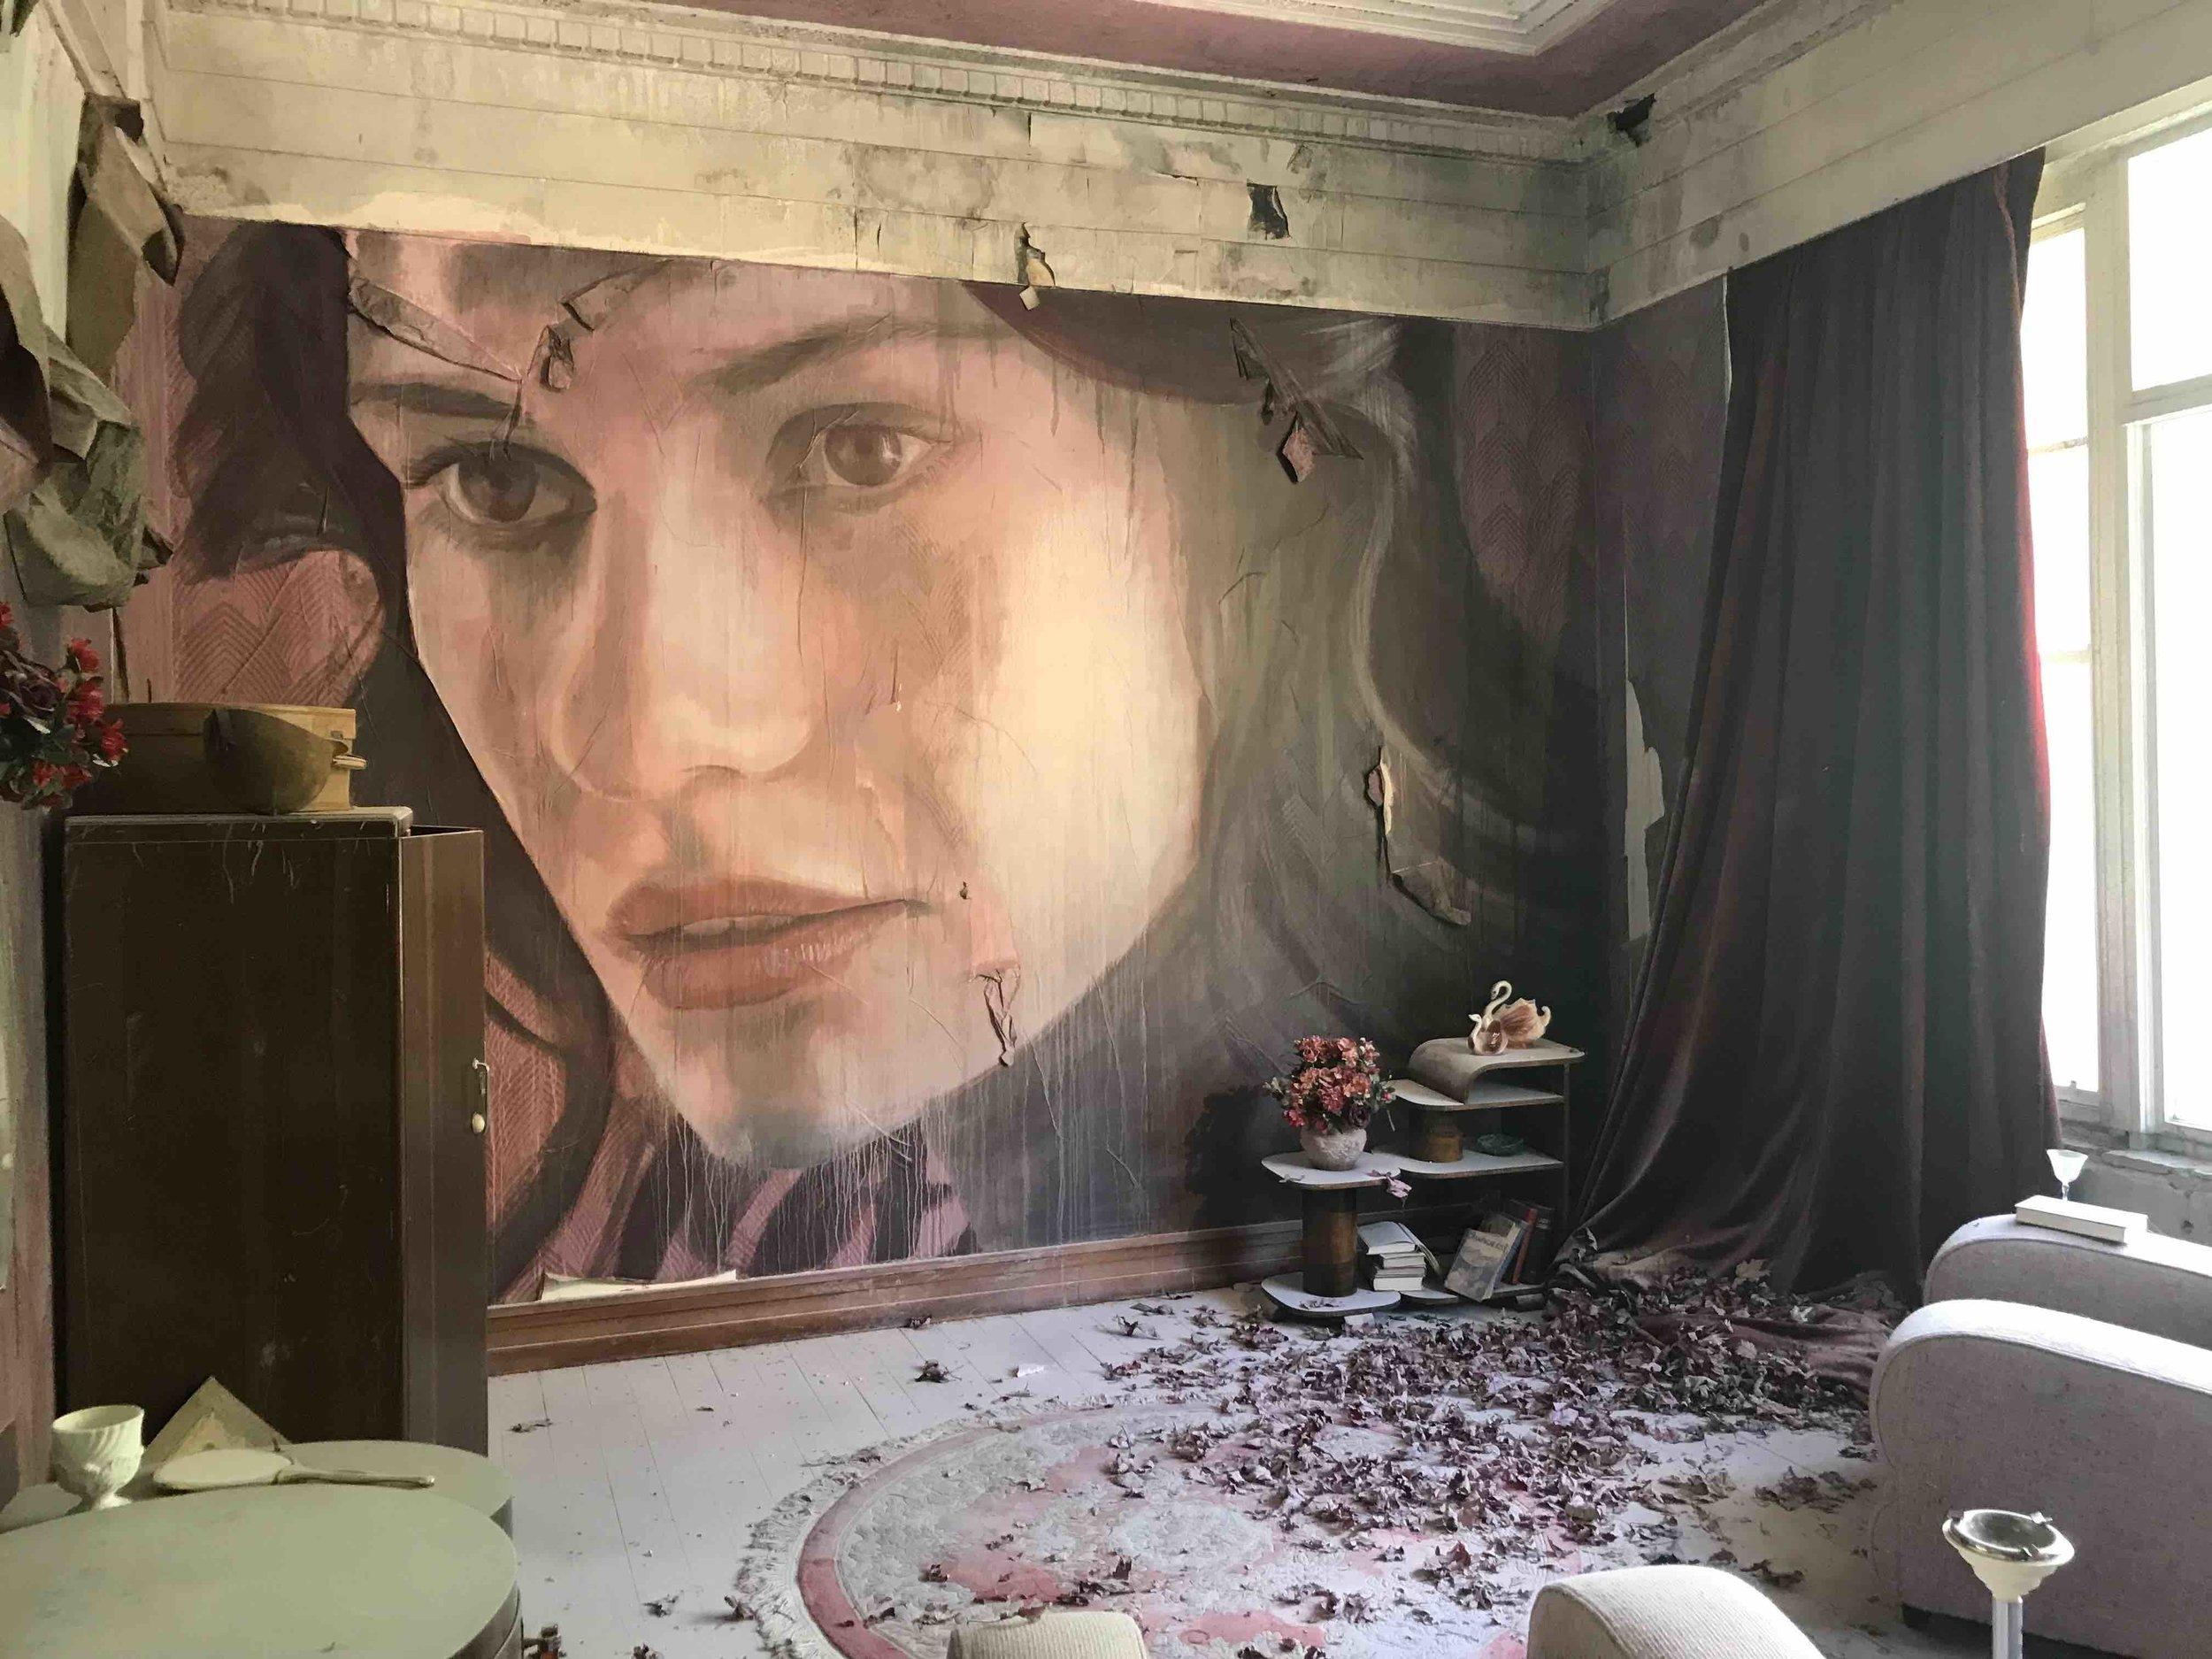 The Scarlet Room (Photo: Laura Jocic)